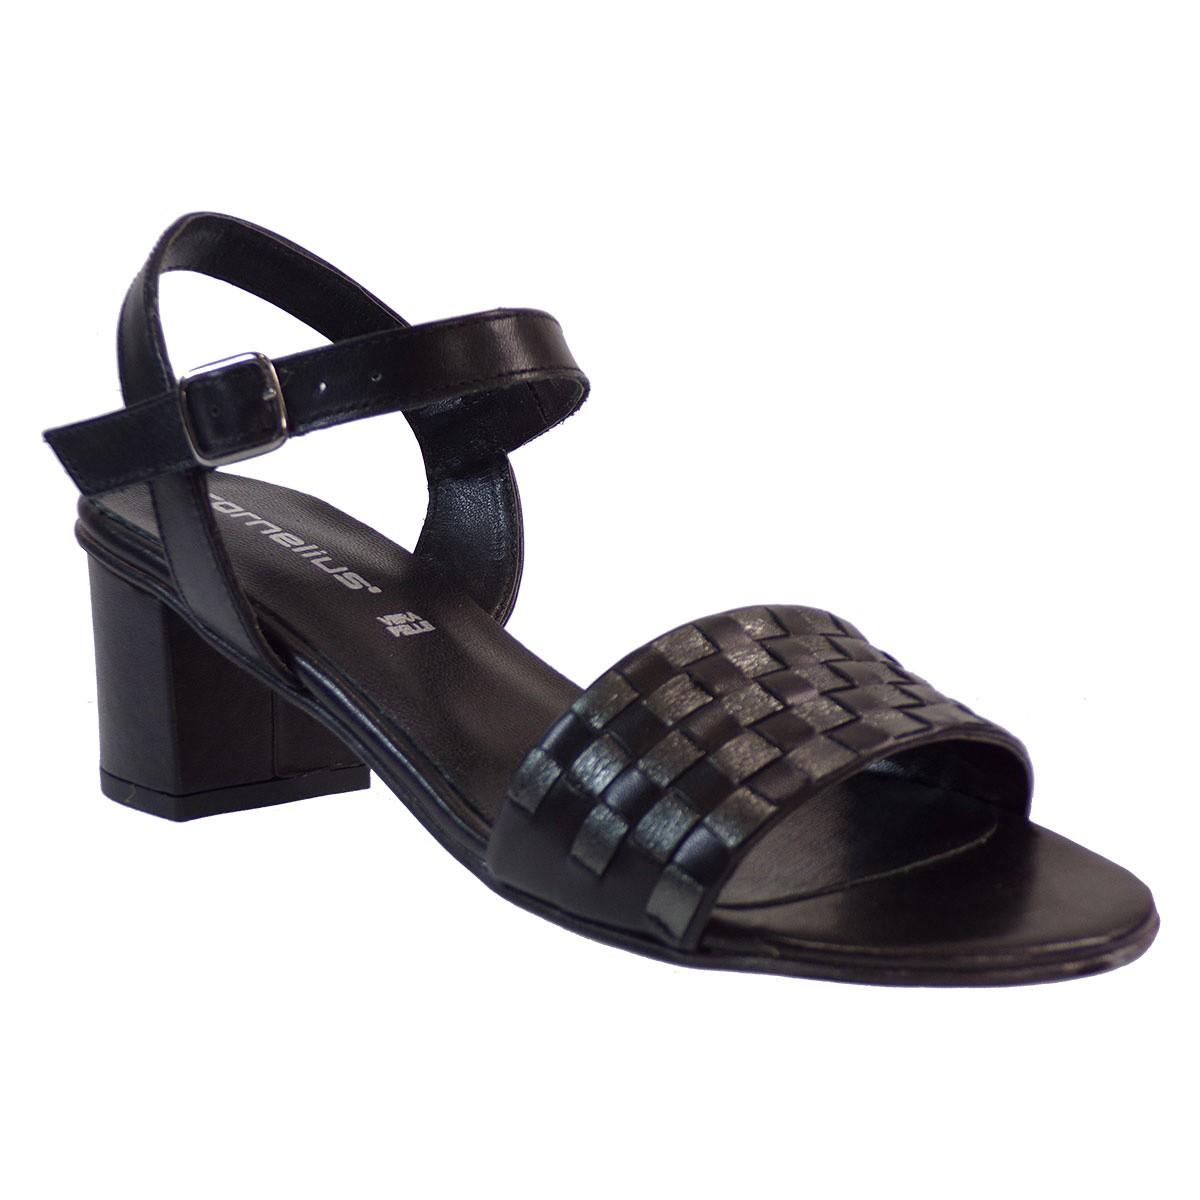 Cornelius Shoes Γυναικεία Πέδιλα 31-260 Μαύρο